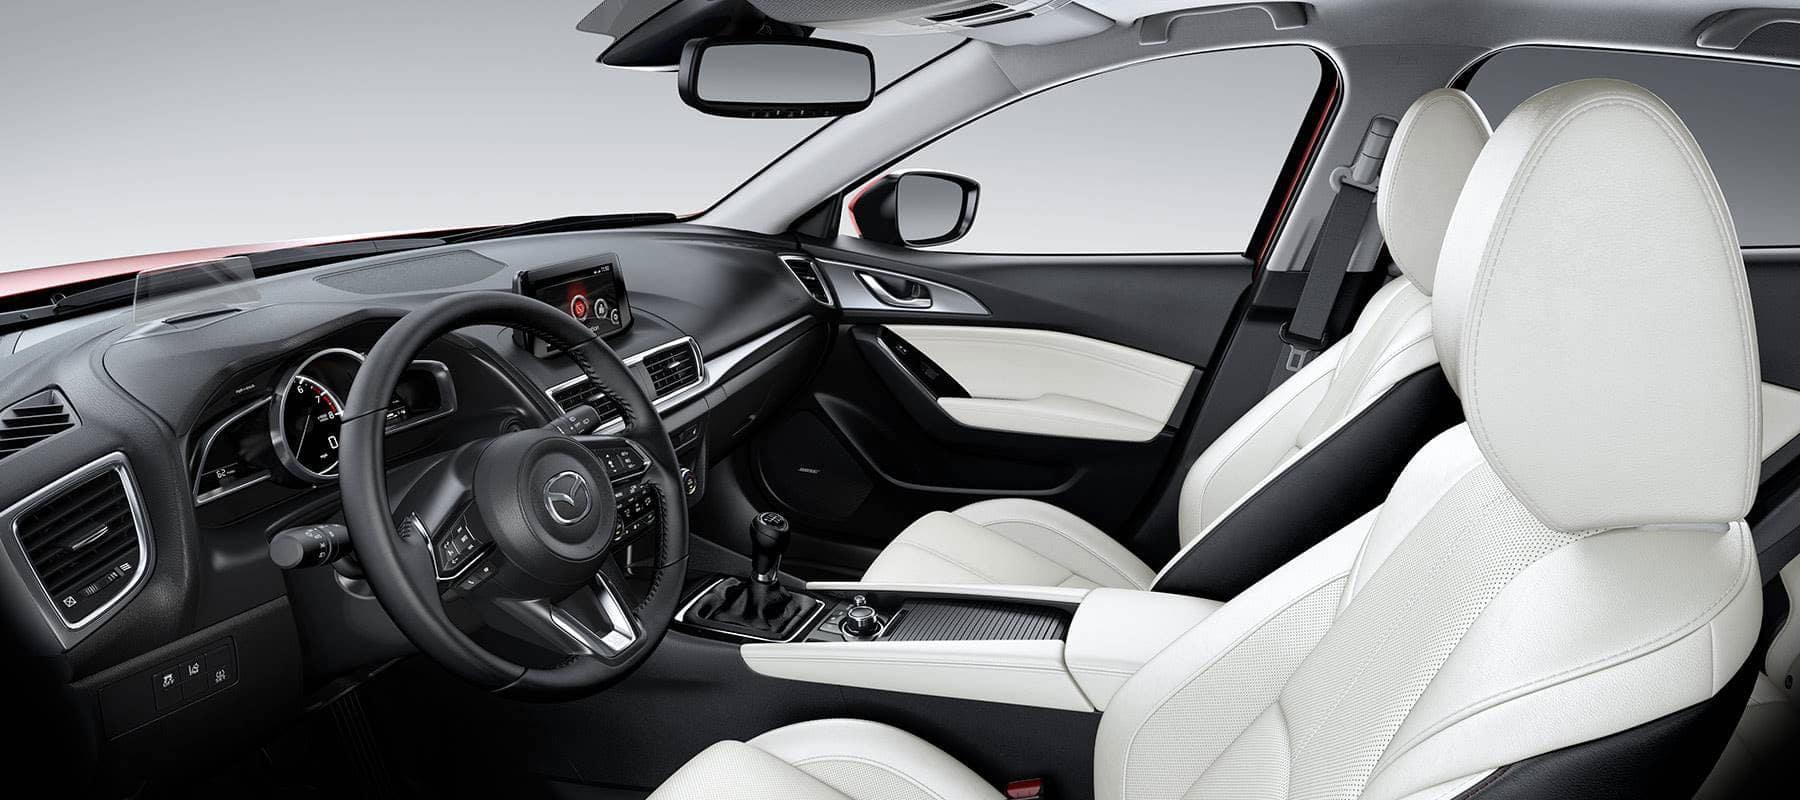 2018-mazda 3 sedan interior white